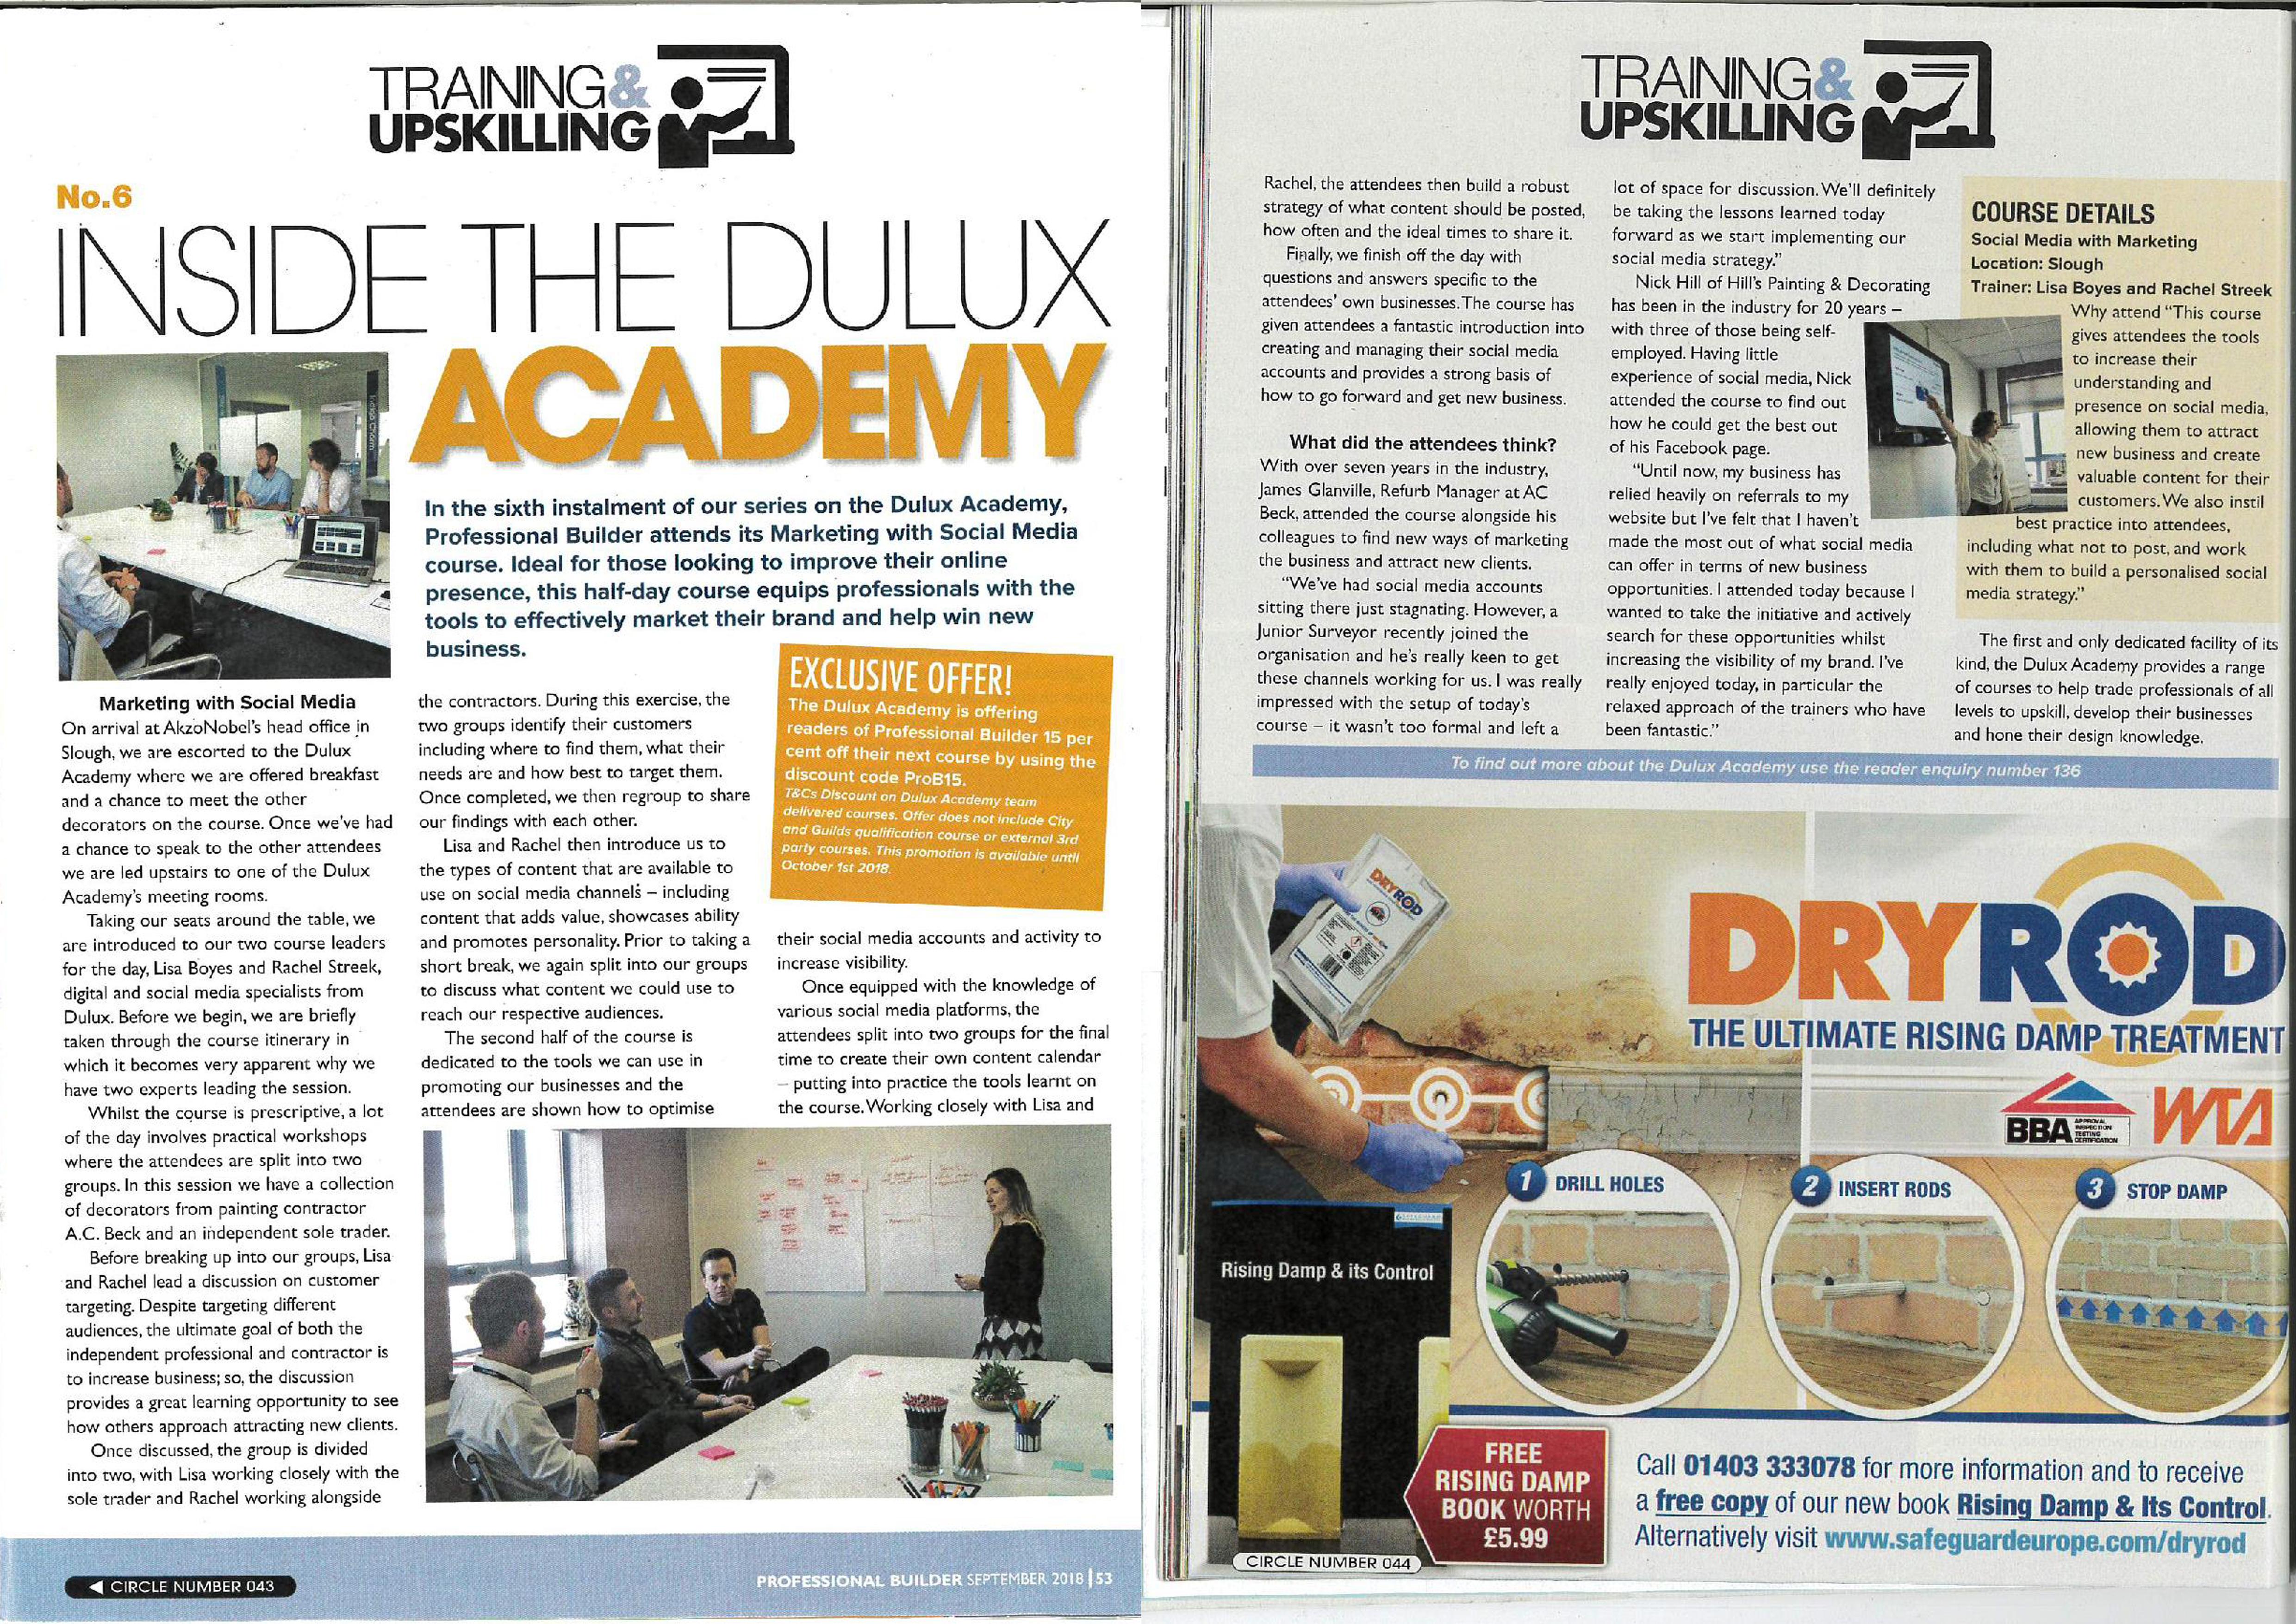 P&D Magazine - My Course